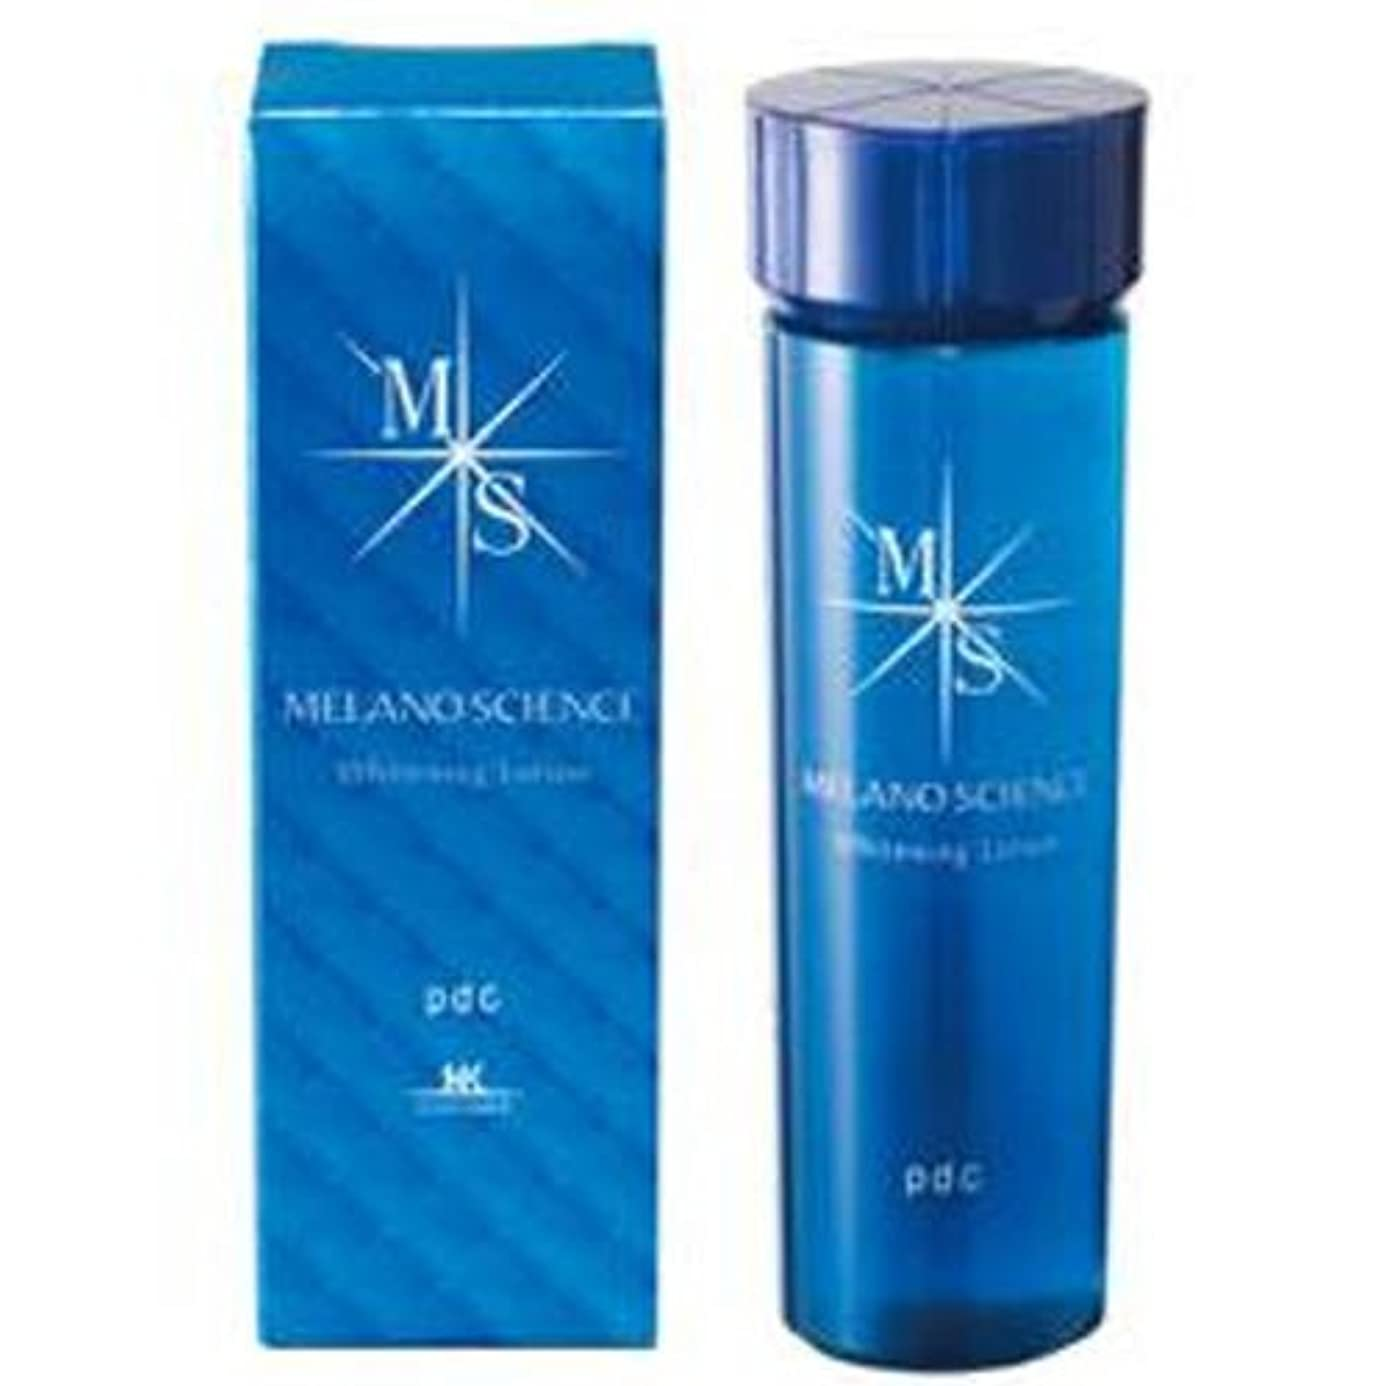 MK メラノサイエンス MELANOSCIENCE ホワイトニングローション 150ml 集中美白 アルブチン 化粧水